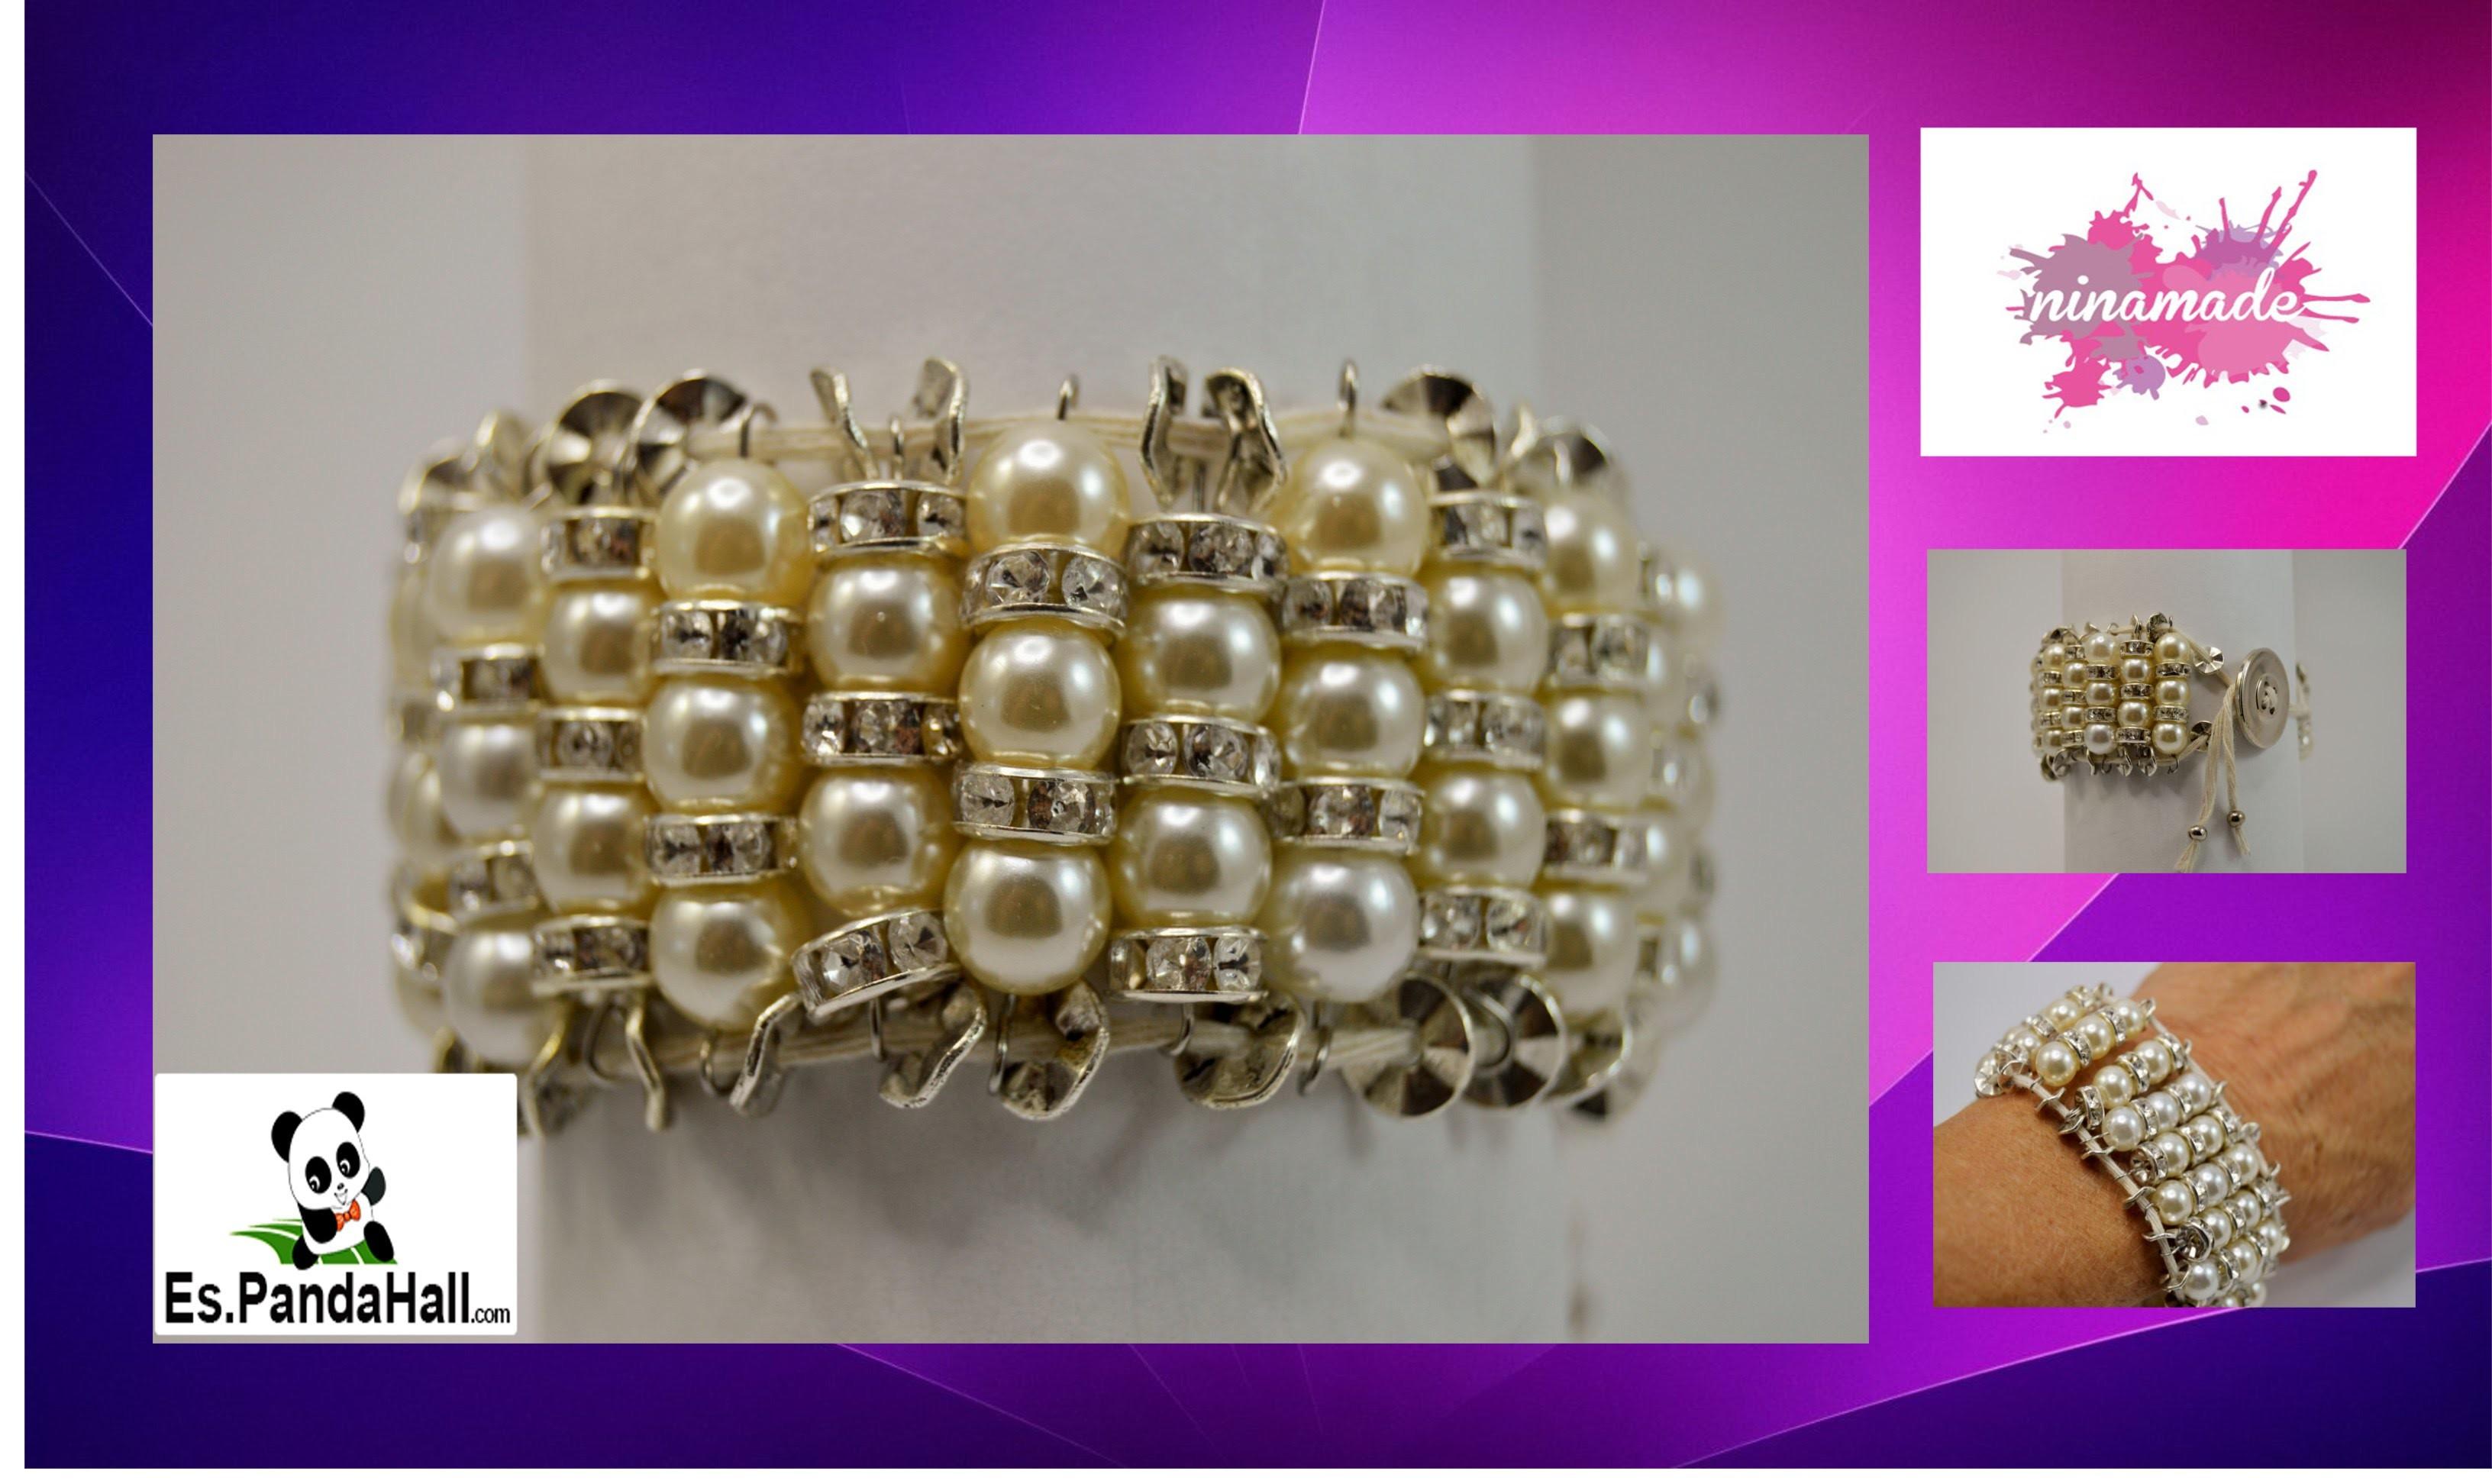 DIY.Tuto18.Pulsera con perlas y rhinestones. Bracelet with Pearl and rhinestone. Es.PandaHall.com